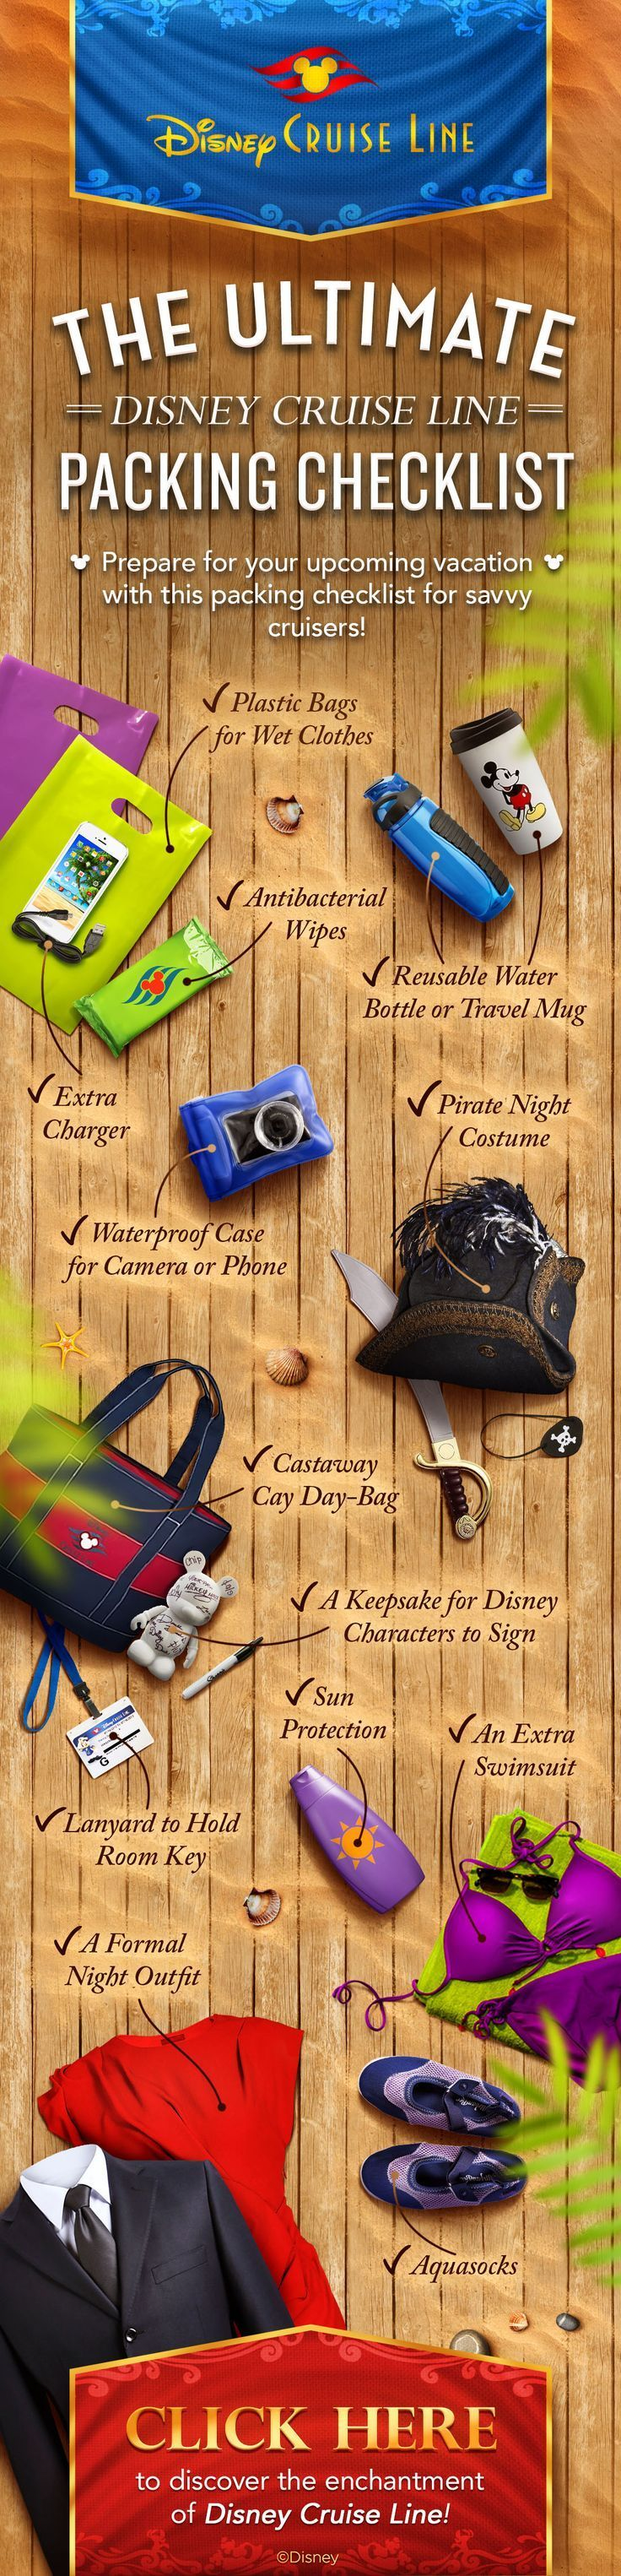 Disney Cruise Line packing checklist